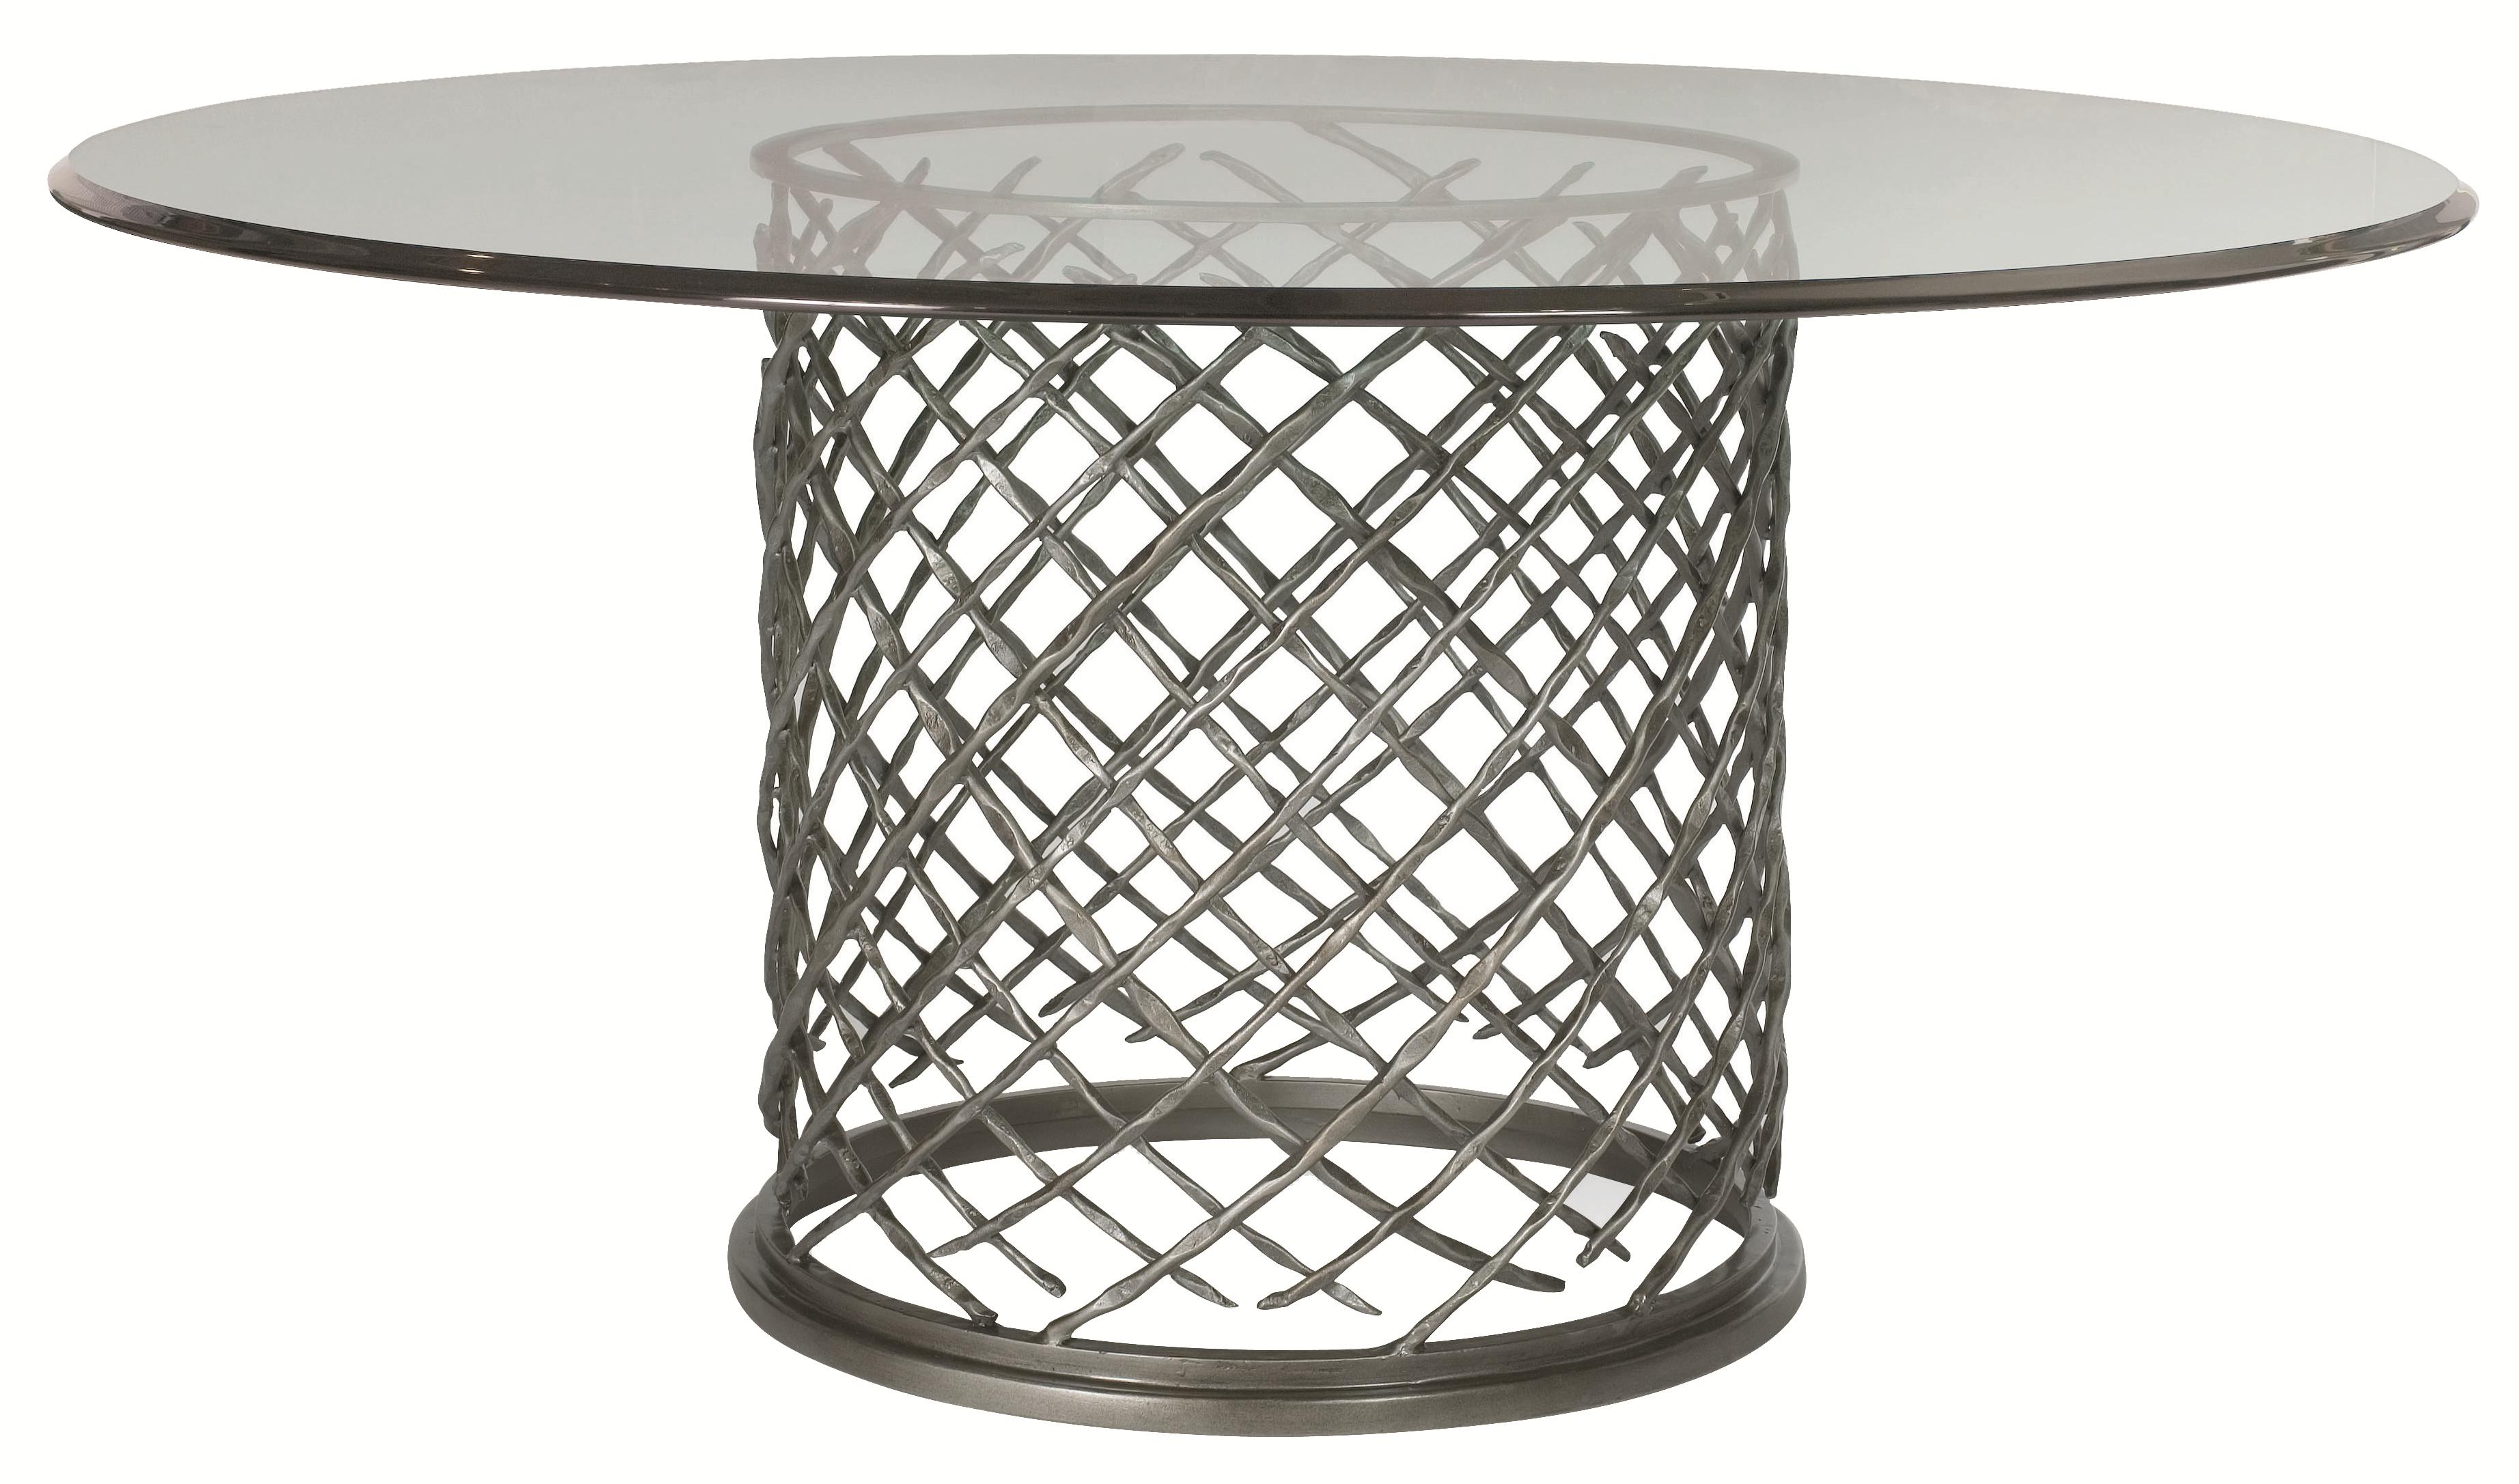 "Bernhardt Hallam Hallam Metal Table with Glass Top (60"") - Item Number: 336-773+998-060"